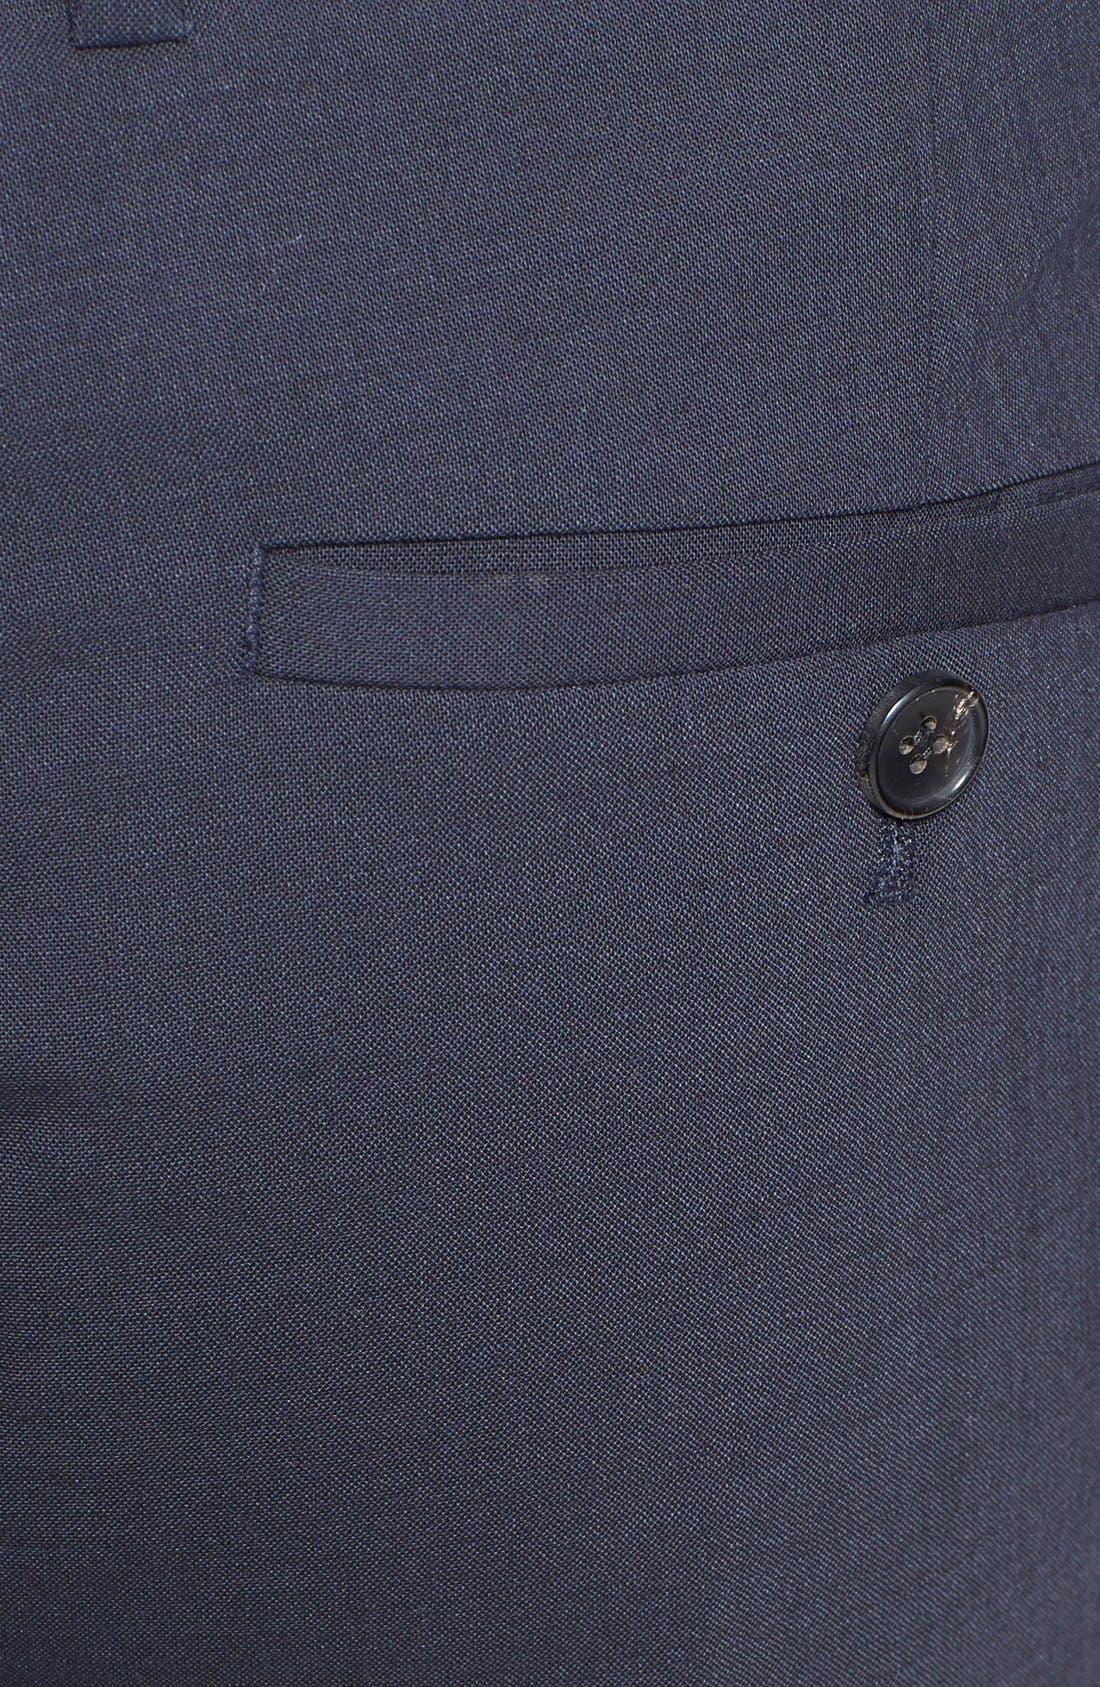 'Marlo New Tailor' Slim Fit Pants,                             Alternate thumbnail 17, color,